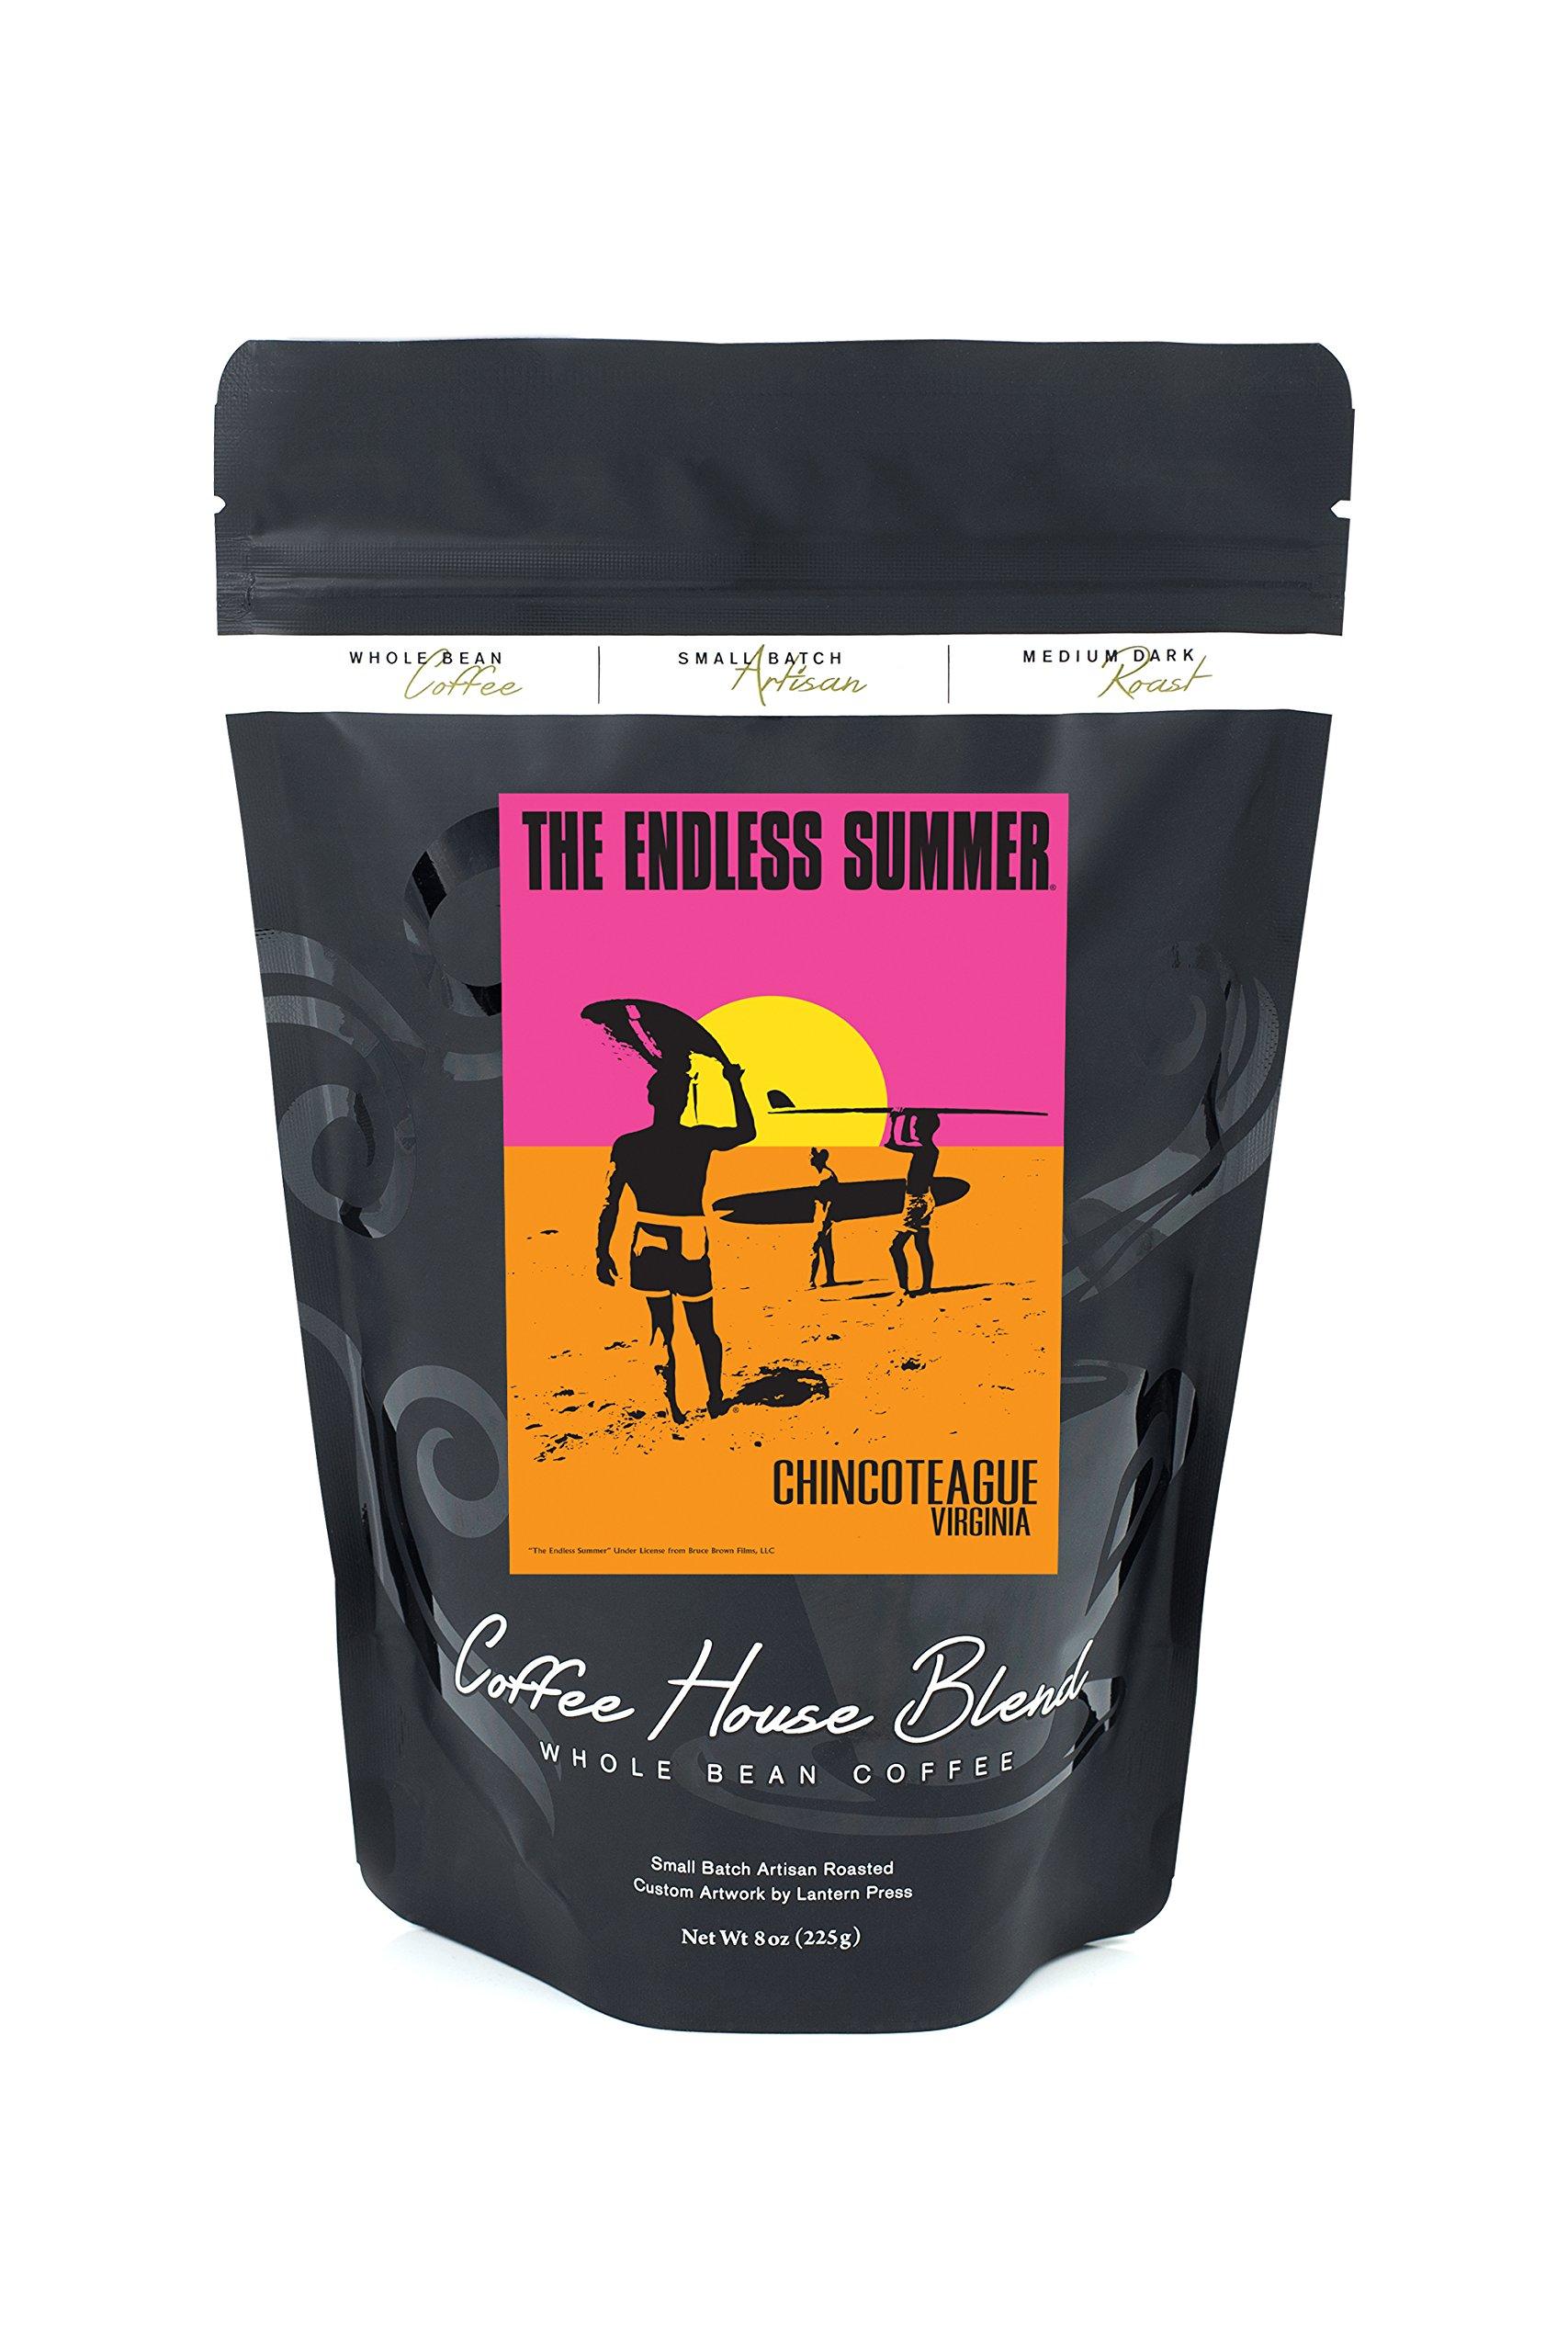 Chincoteague, Virginia - The Endless Summer - Original Movie Poster (8oz Whole Bean Small Batch Artisan Coffee - Bold & Strong Medium Dark Roast w/ Artwork)